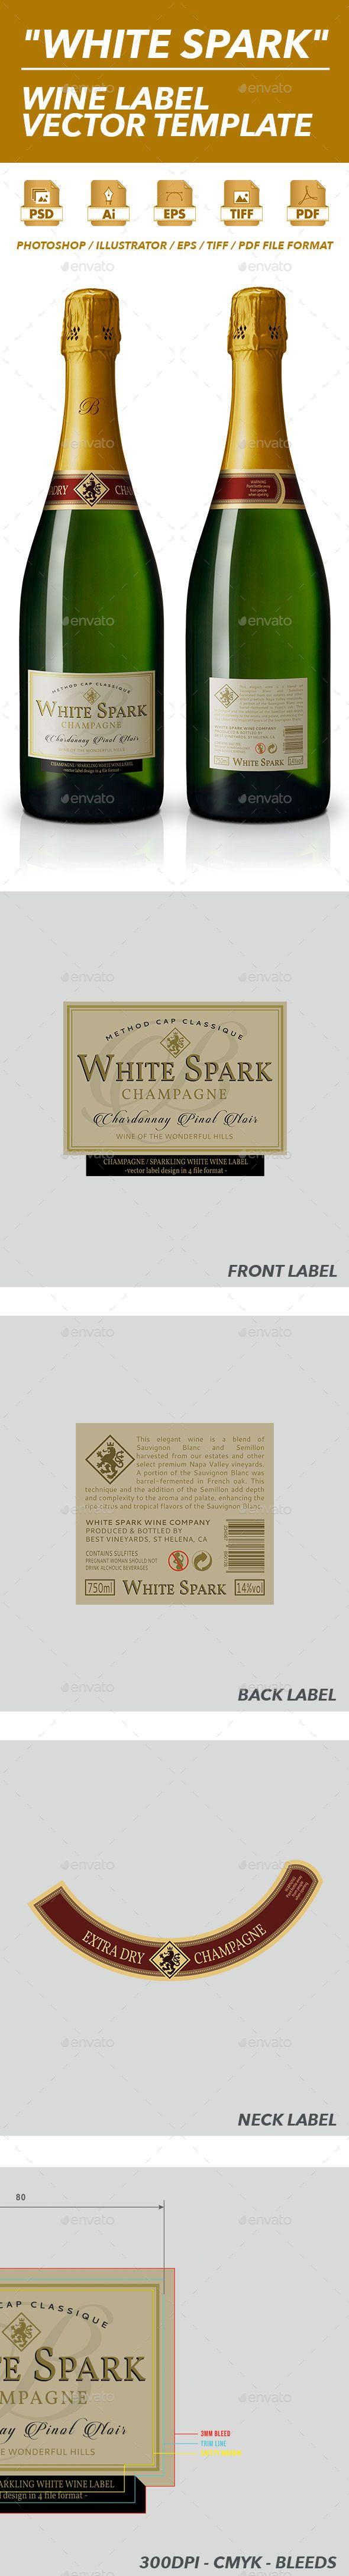 Sparkling Wine Label Vector Template Print